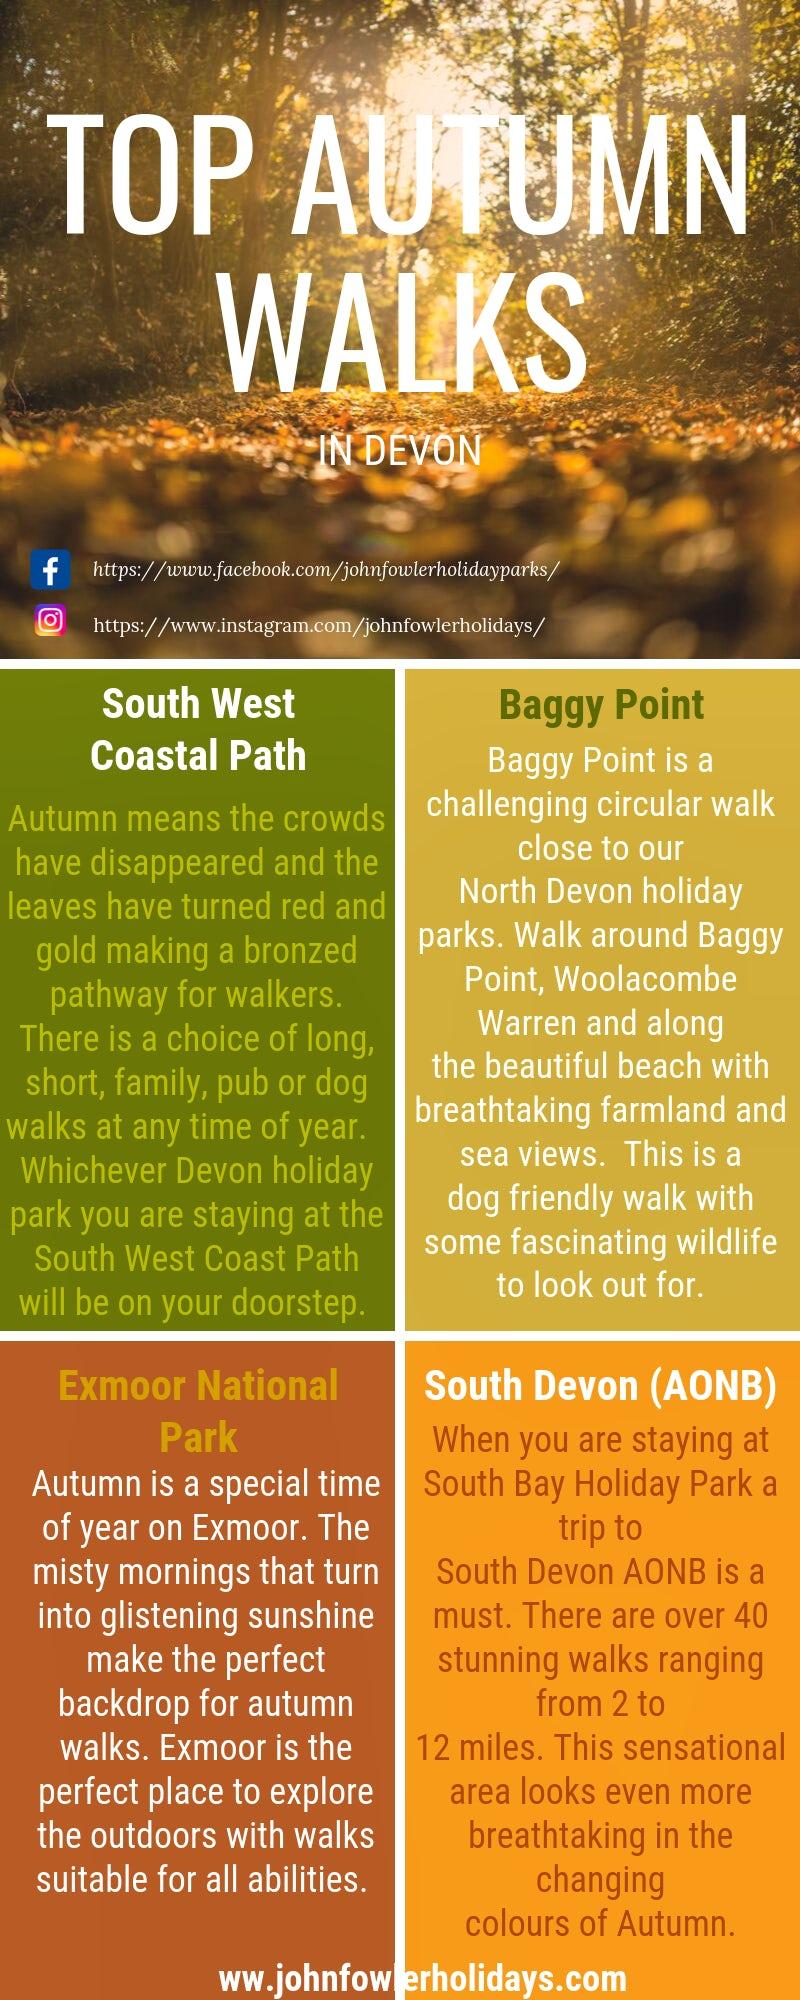 Top Autumn Walks in Devon   John Fowler Holidays Infographic